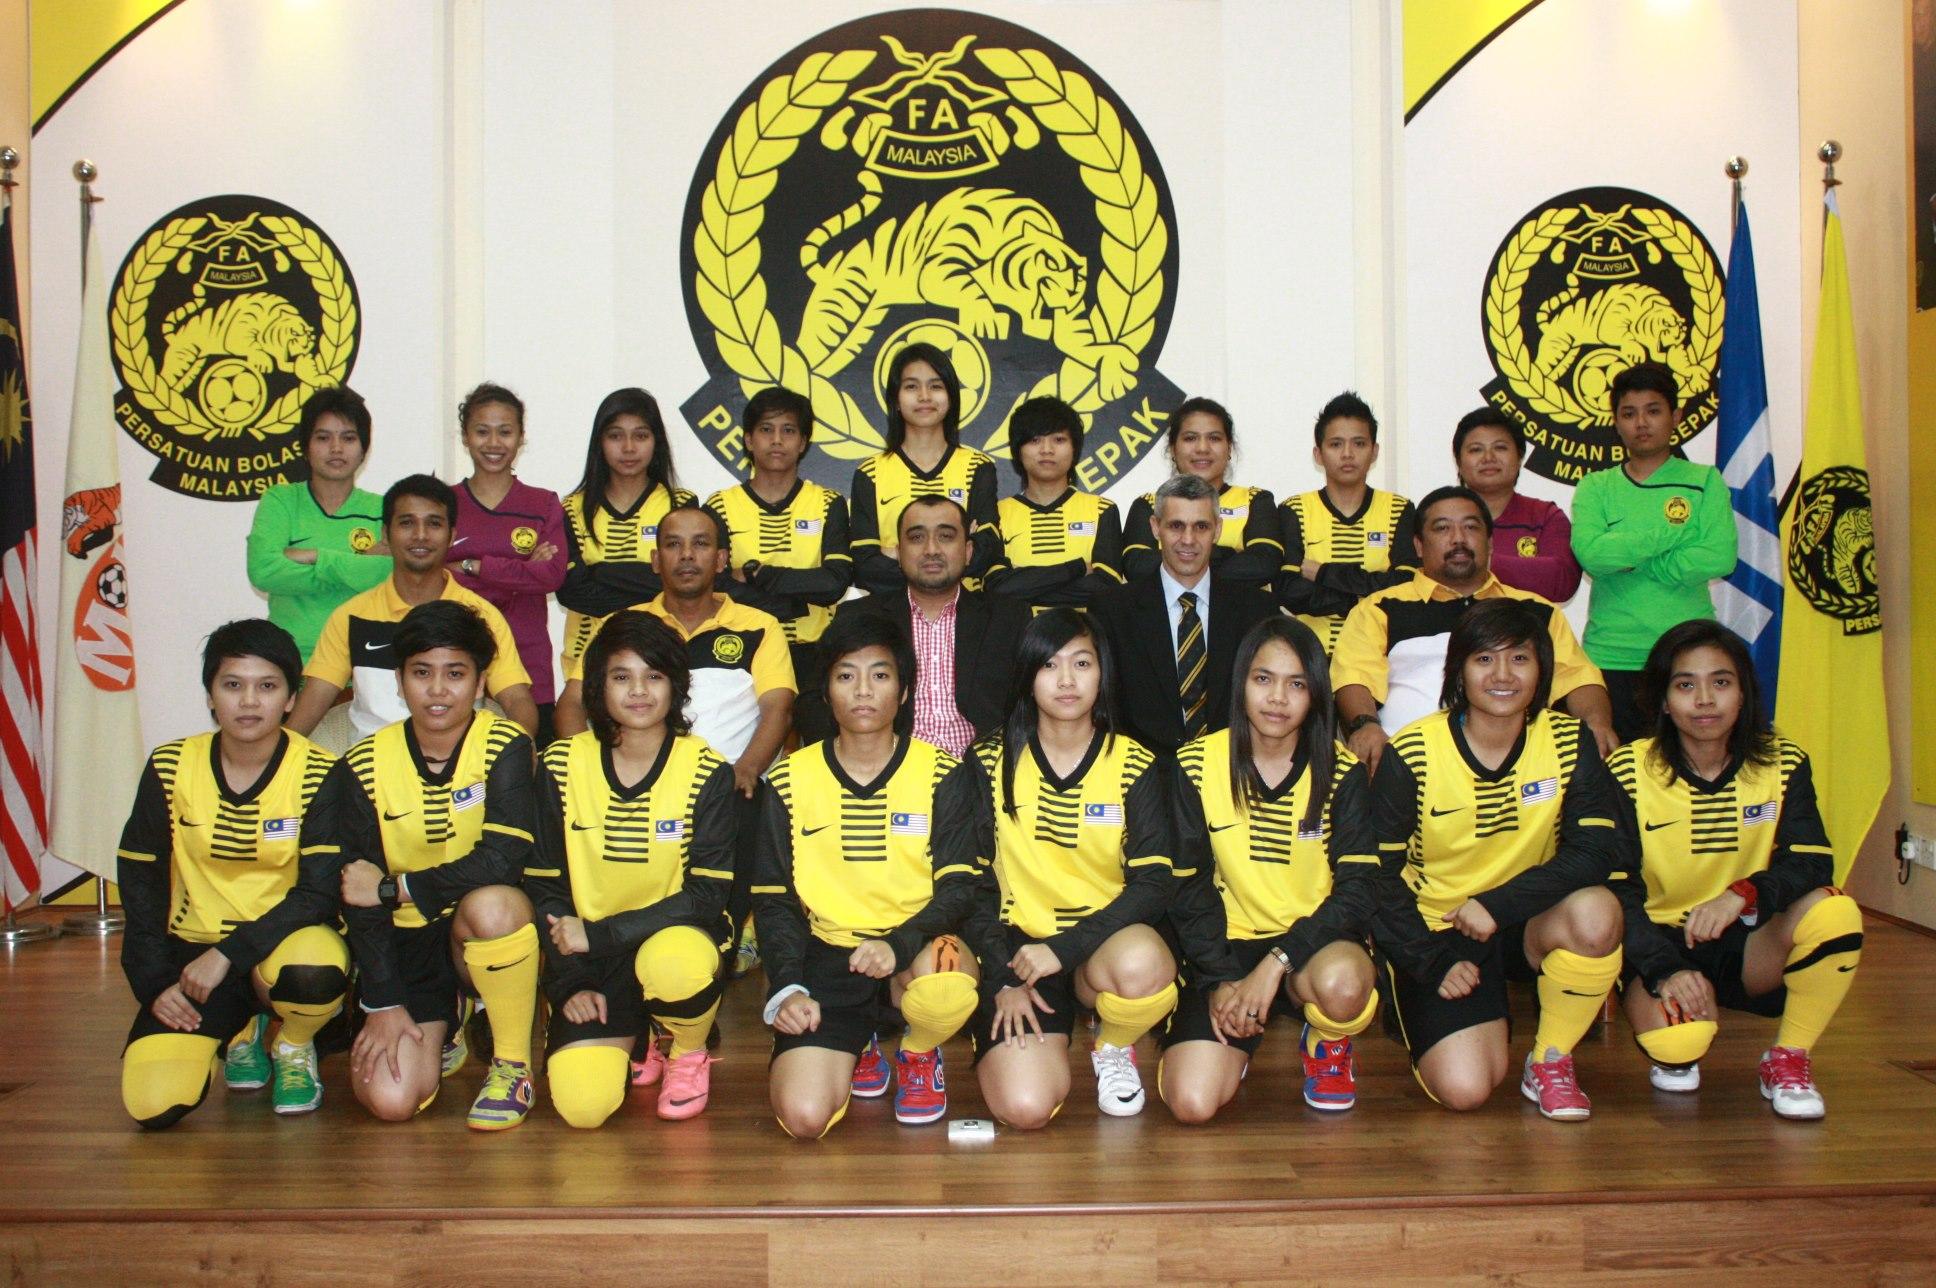 FIFA, женский футзал, женские сборные, womens national futsal team, futsal, malaysia womens futsal team